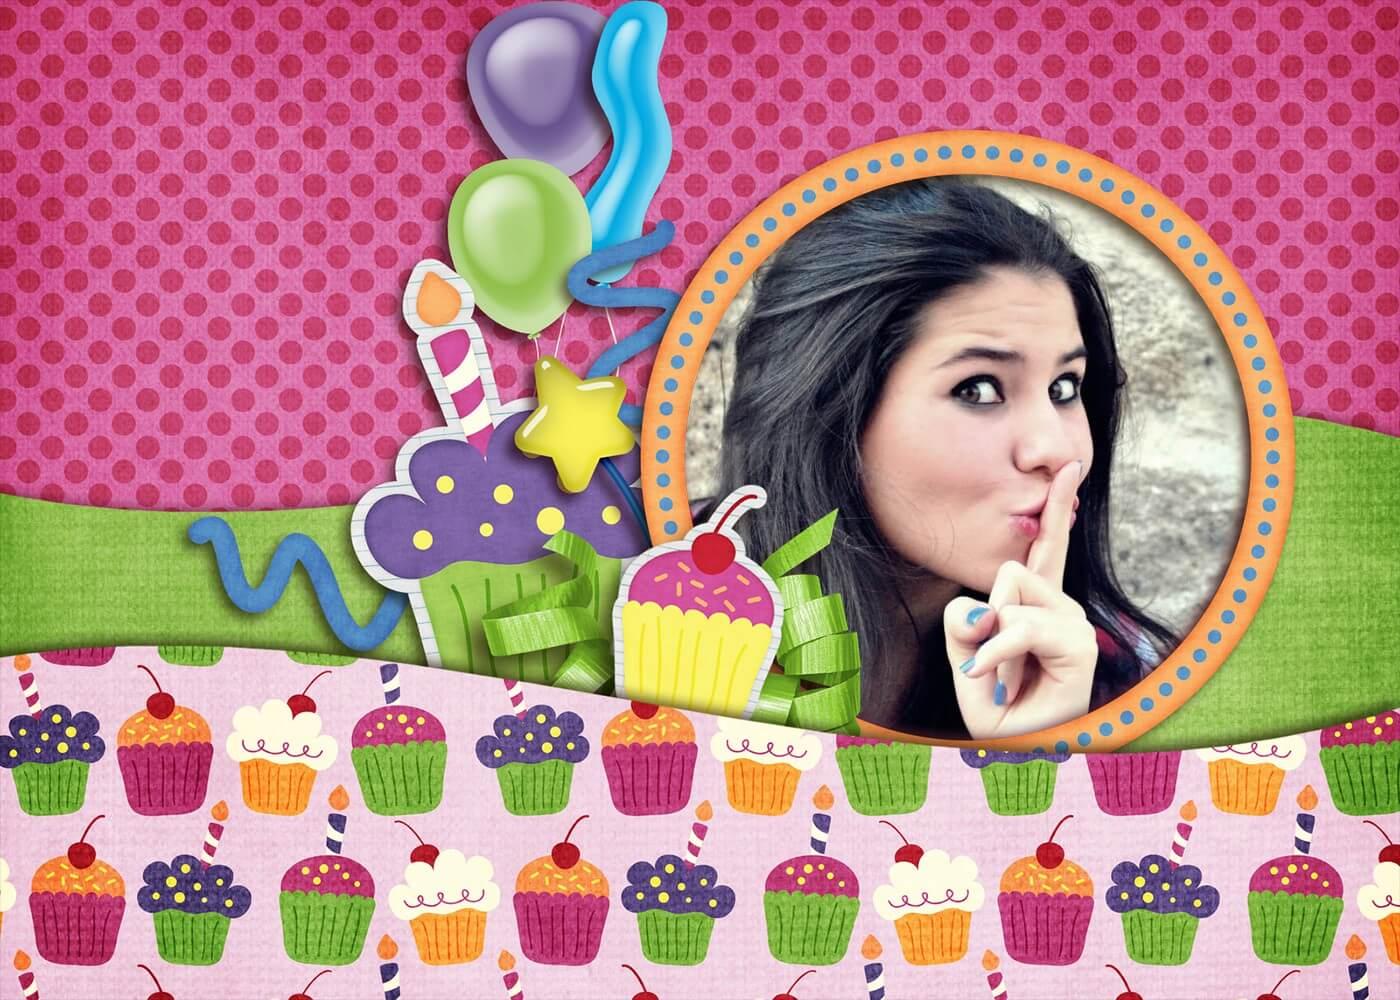 moldura-colorida-com-brownies-para-aniversario